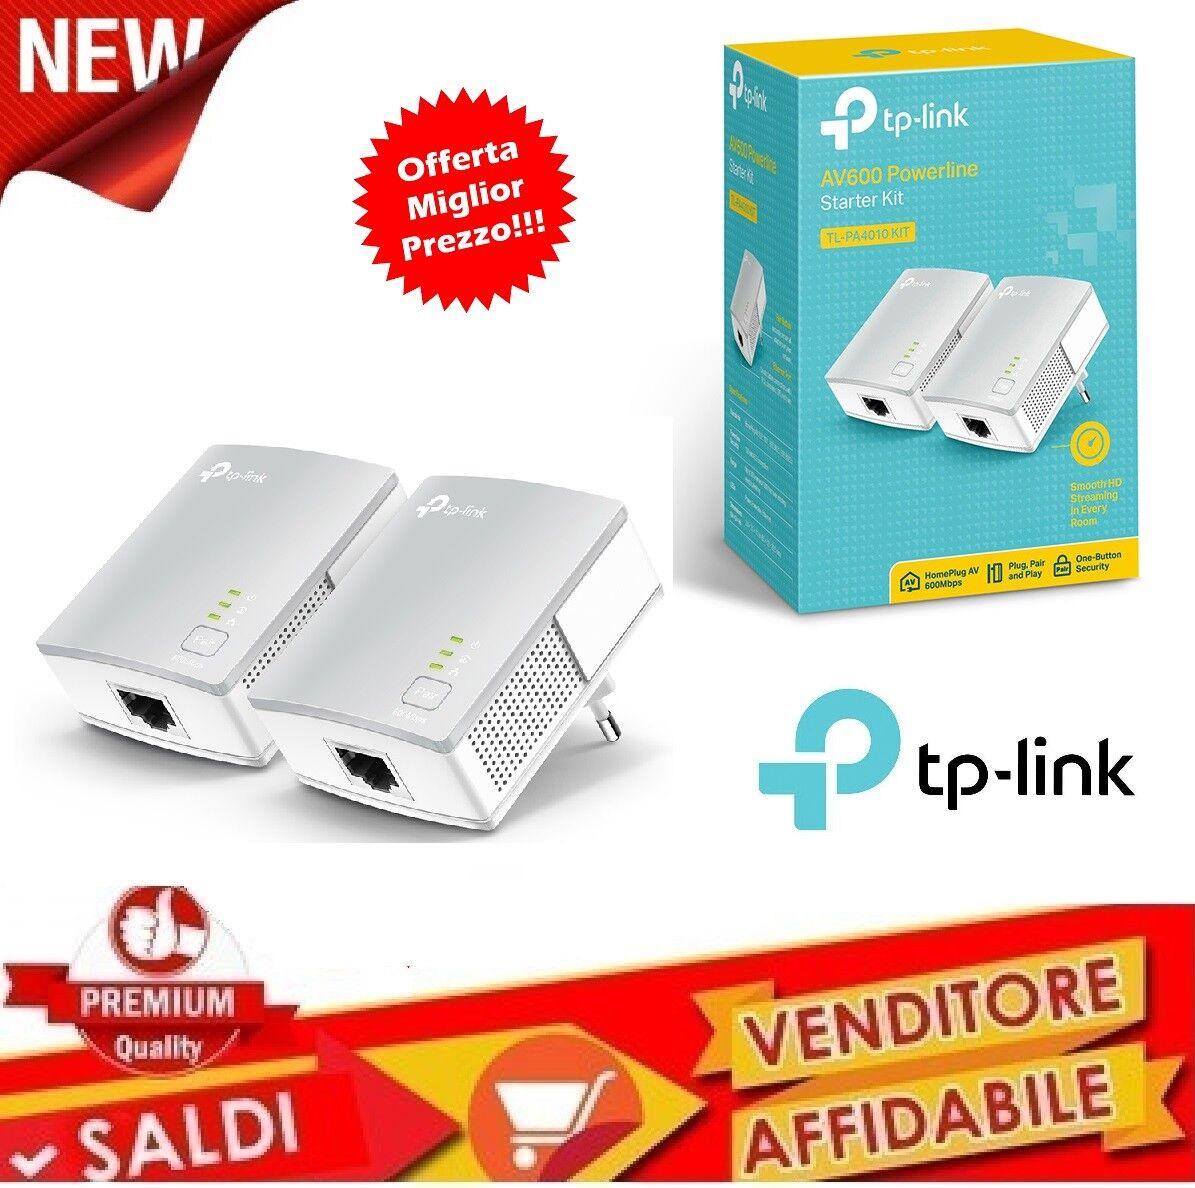 ADATTATORE DI RETE 2 X POWERLINE TP-LINK STARTER KIT TL-PA4010KIT 600MBPS V 2.0